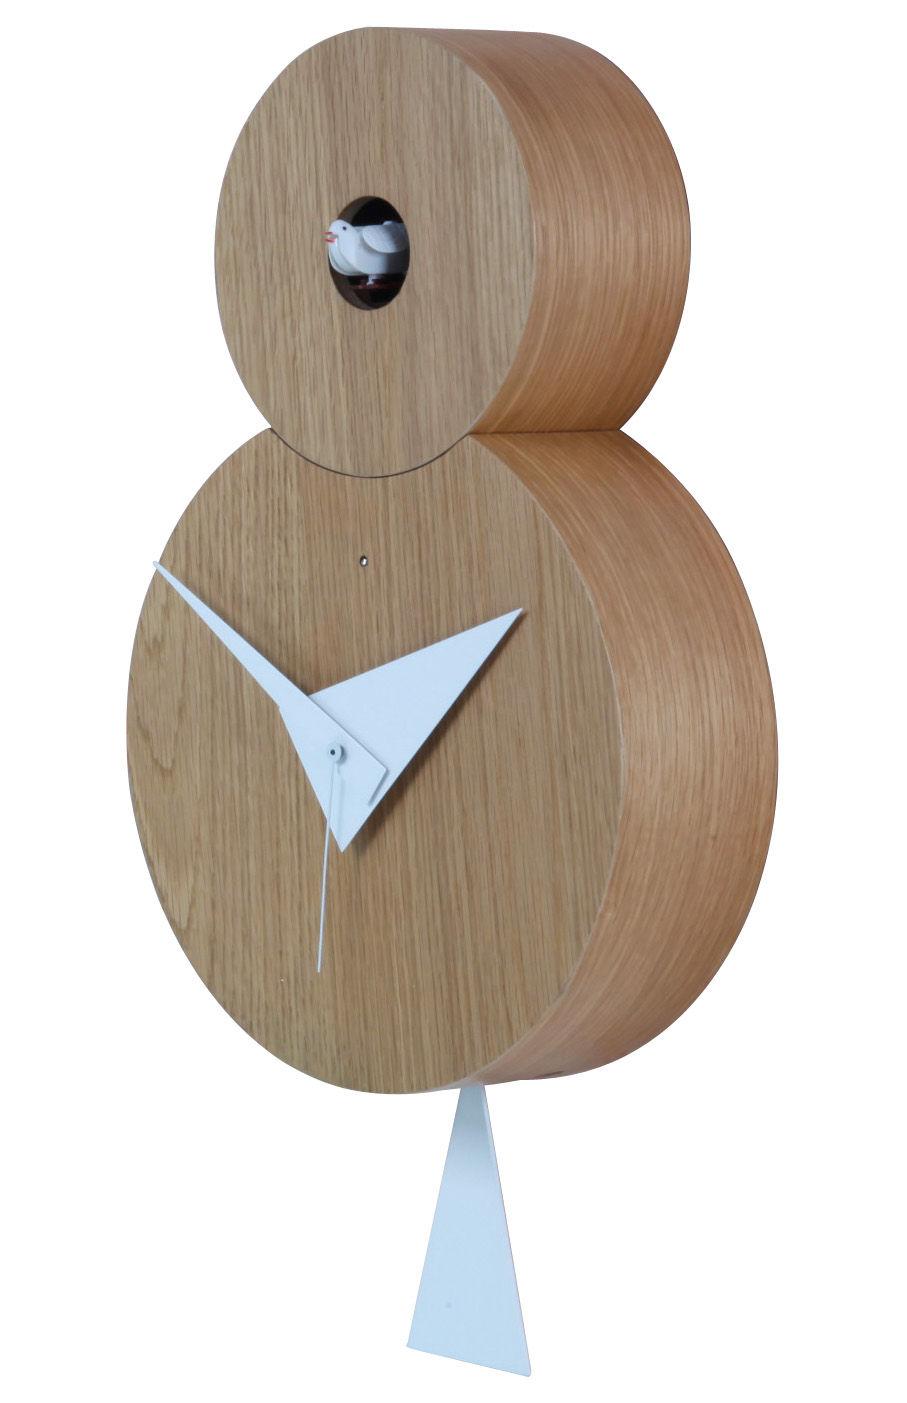 Horloge murale otto à coucou / h 38,5 cm chêne naturel   coucou ...